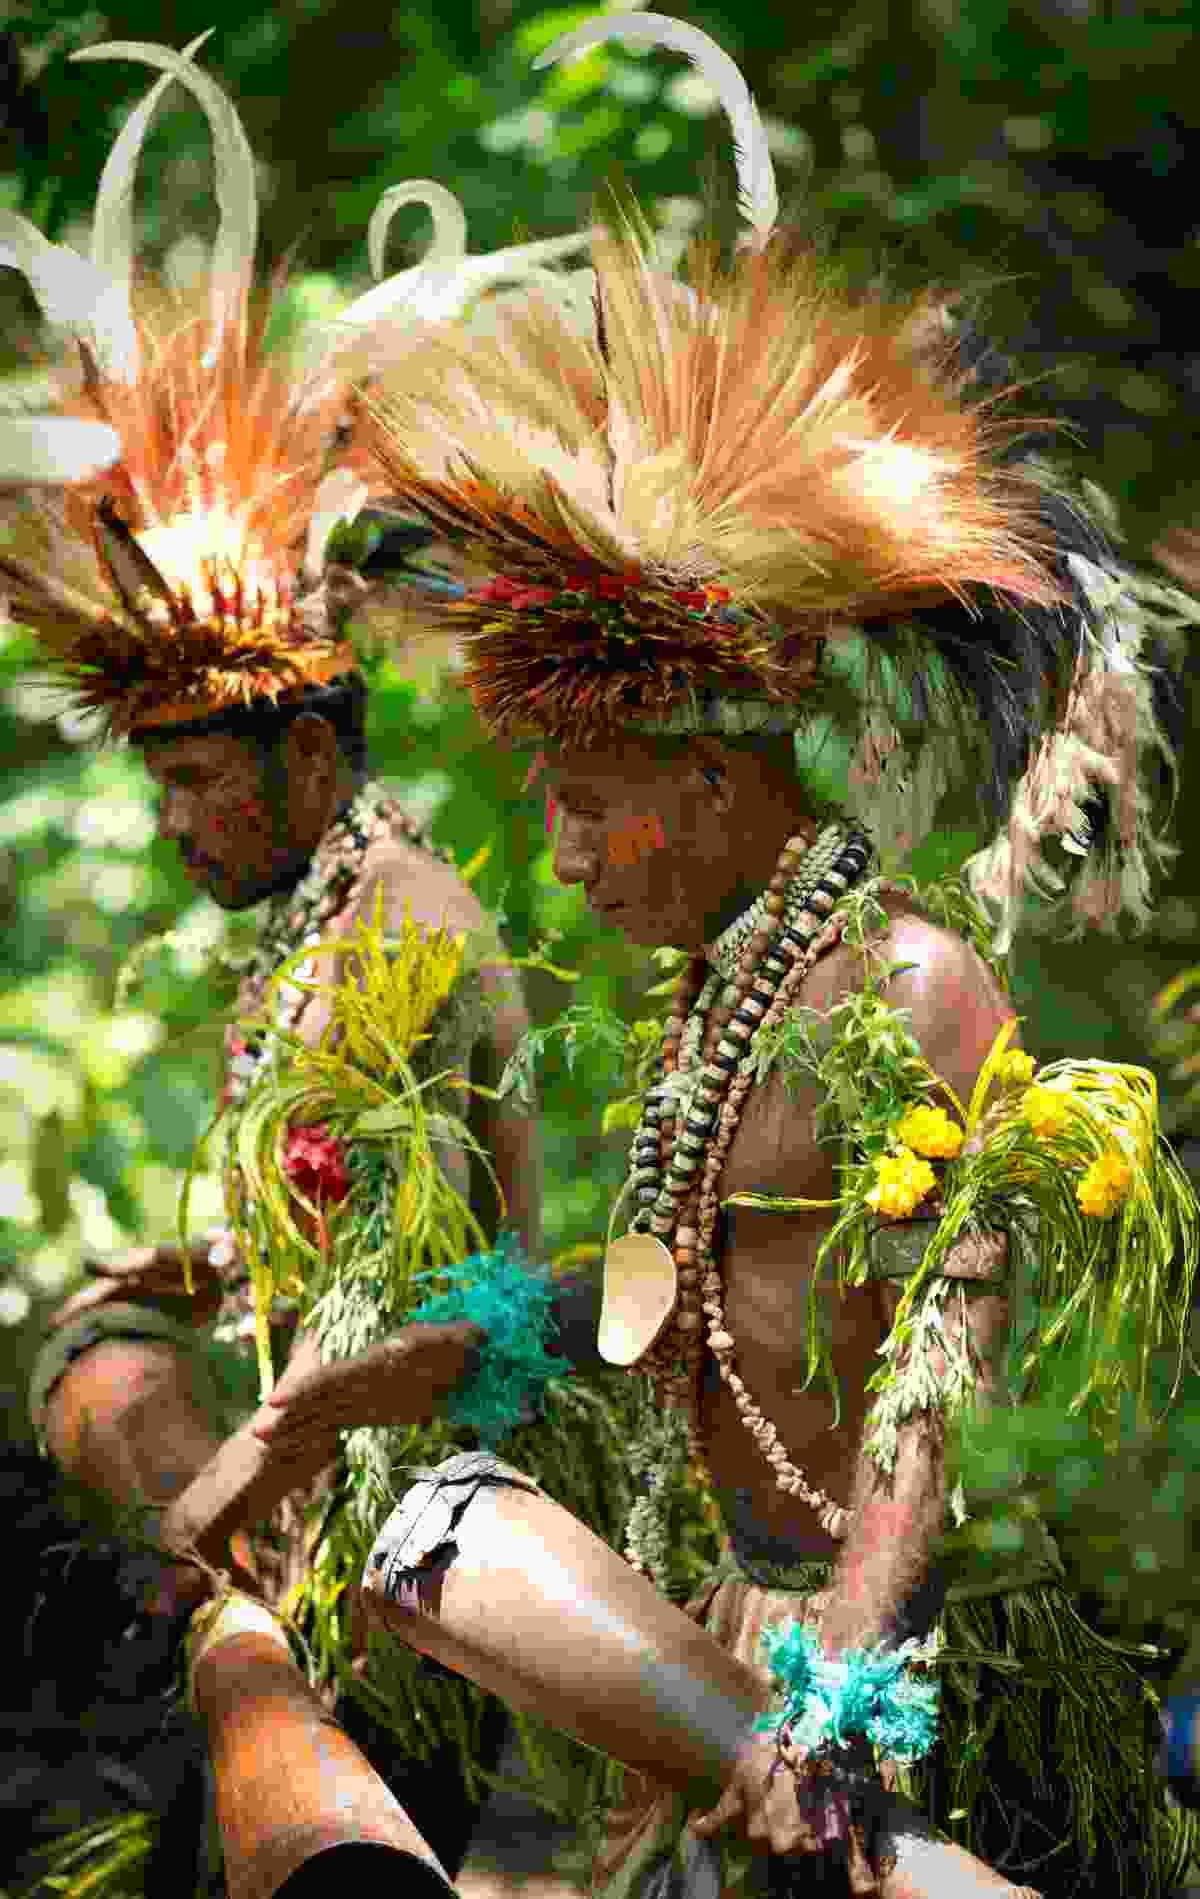 Tufi residents (PNGTPA)